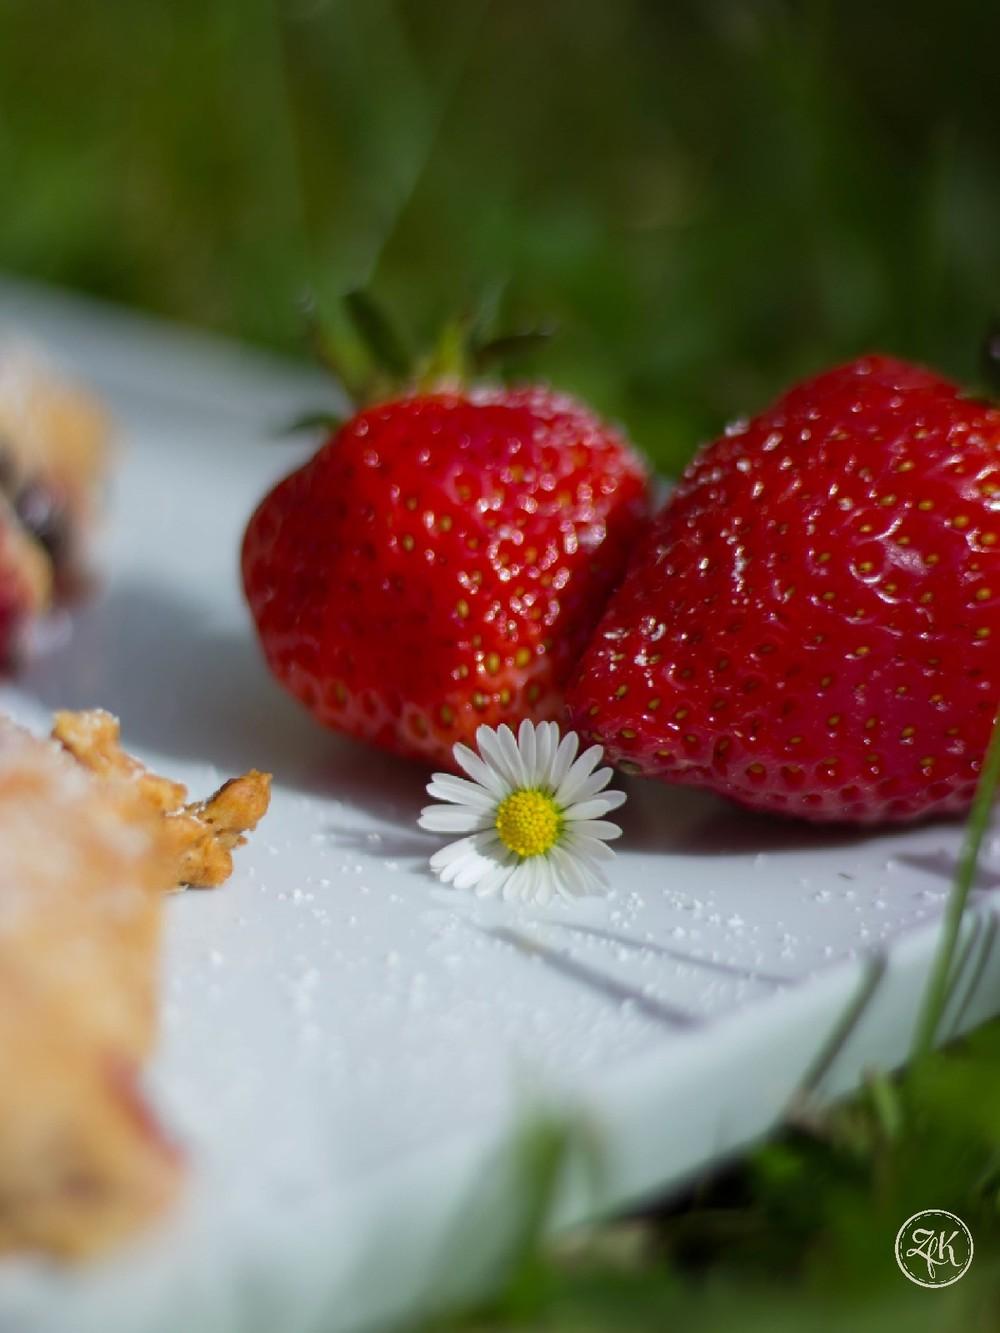 Erdbeersaison - yummy!